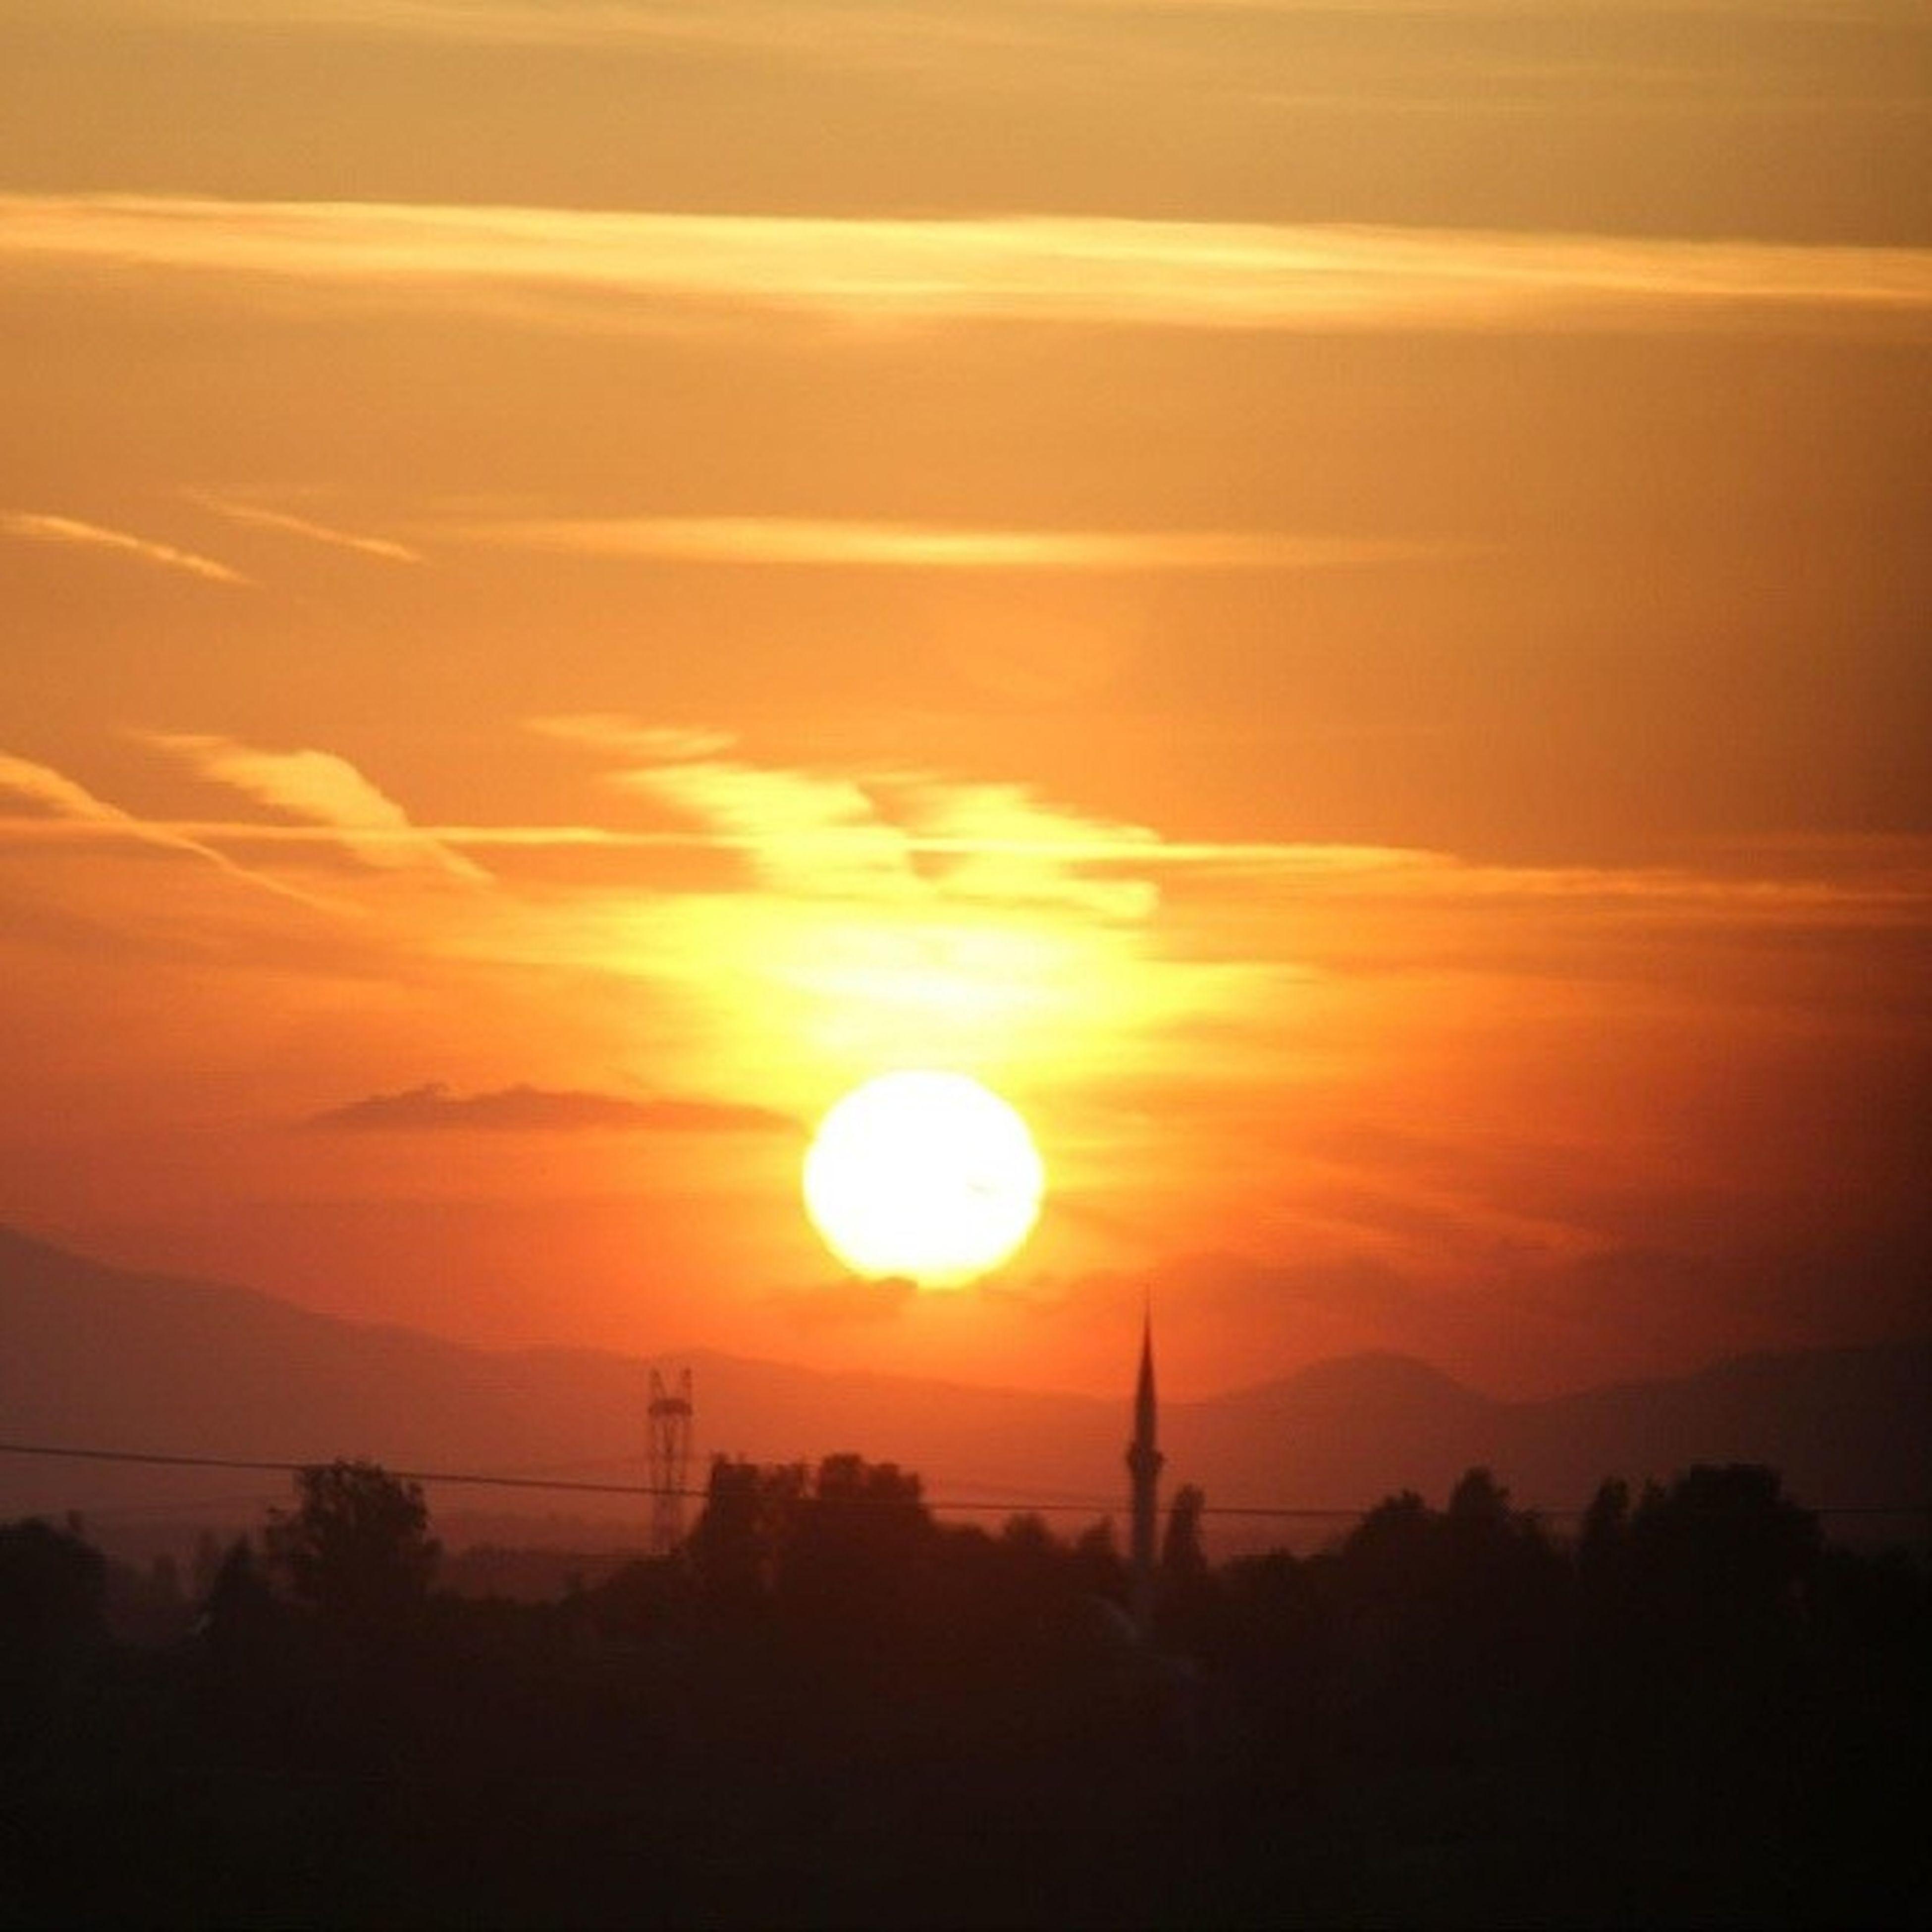 sunset, silhouette, orange color, scenics, sun, tranquil scene, beauty in nature, tranquility, idyllic, sky, nature, landscape, tree, sunlight, majestic, outdoors, mountain, outline, cloud - sky, non-urban scene